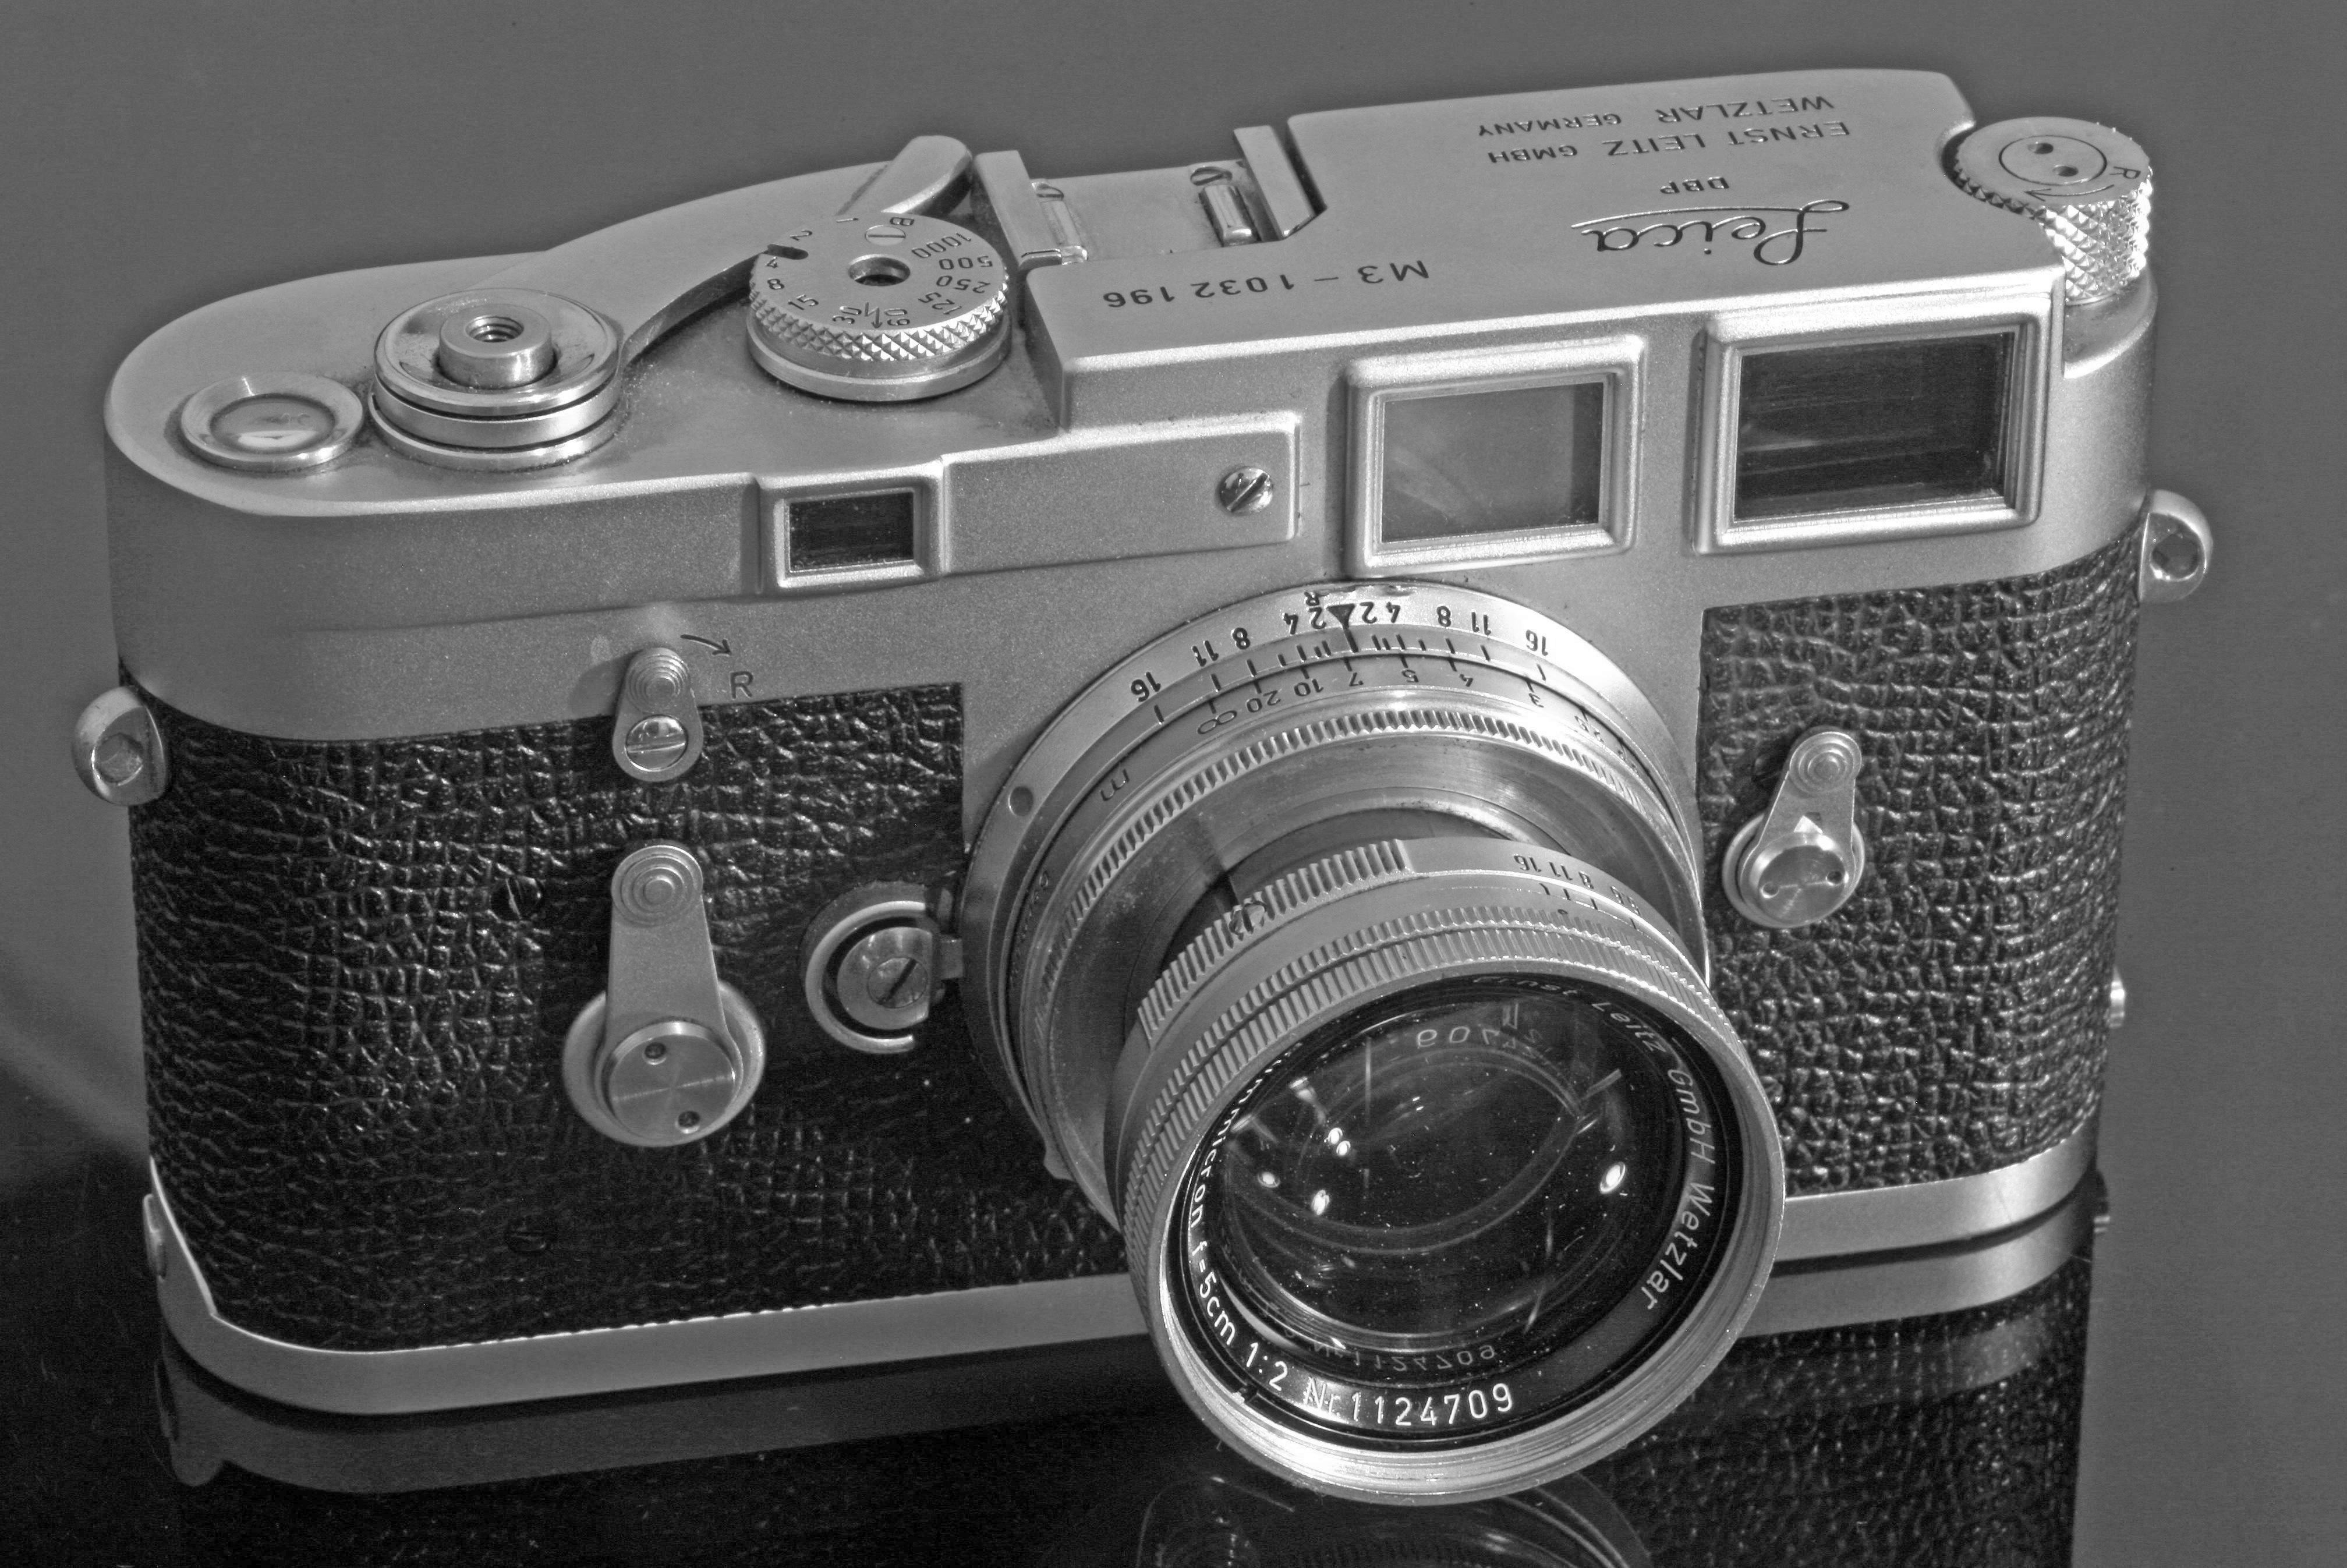 Leica Entfernungsmesser D2 : Leica m u wikipedia